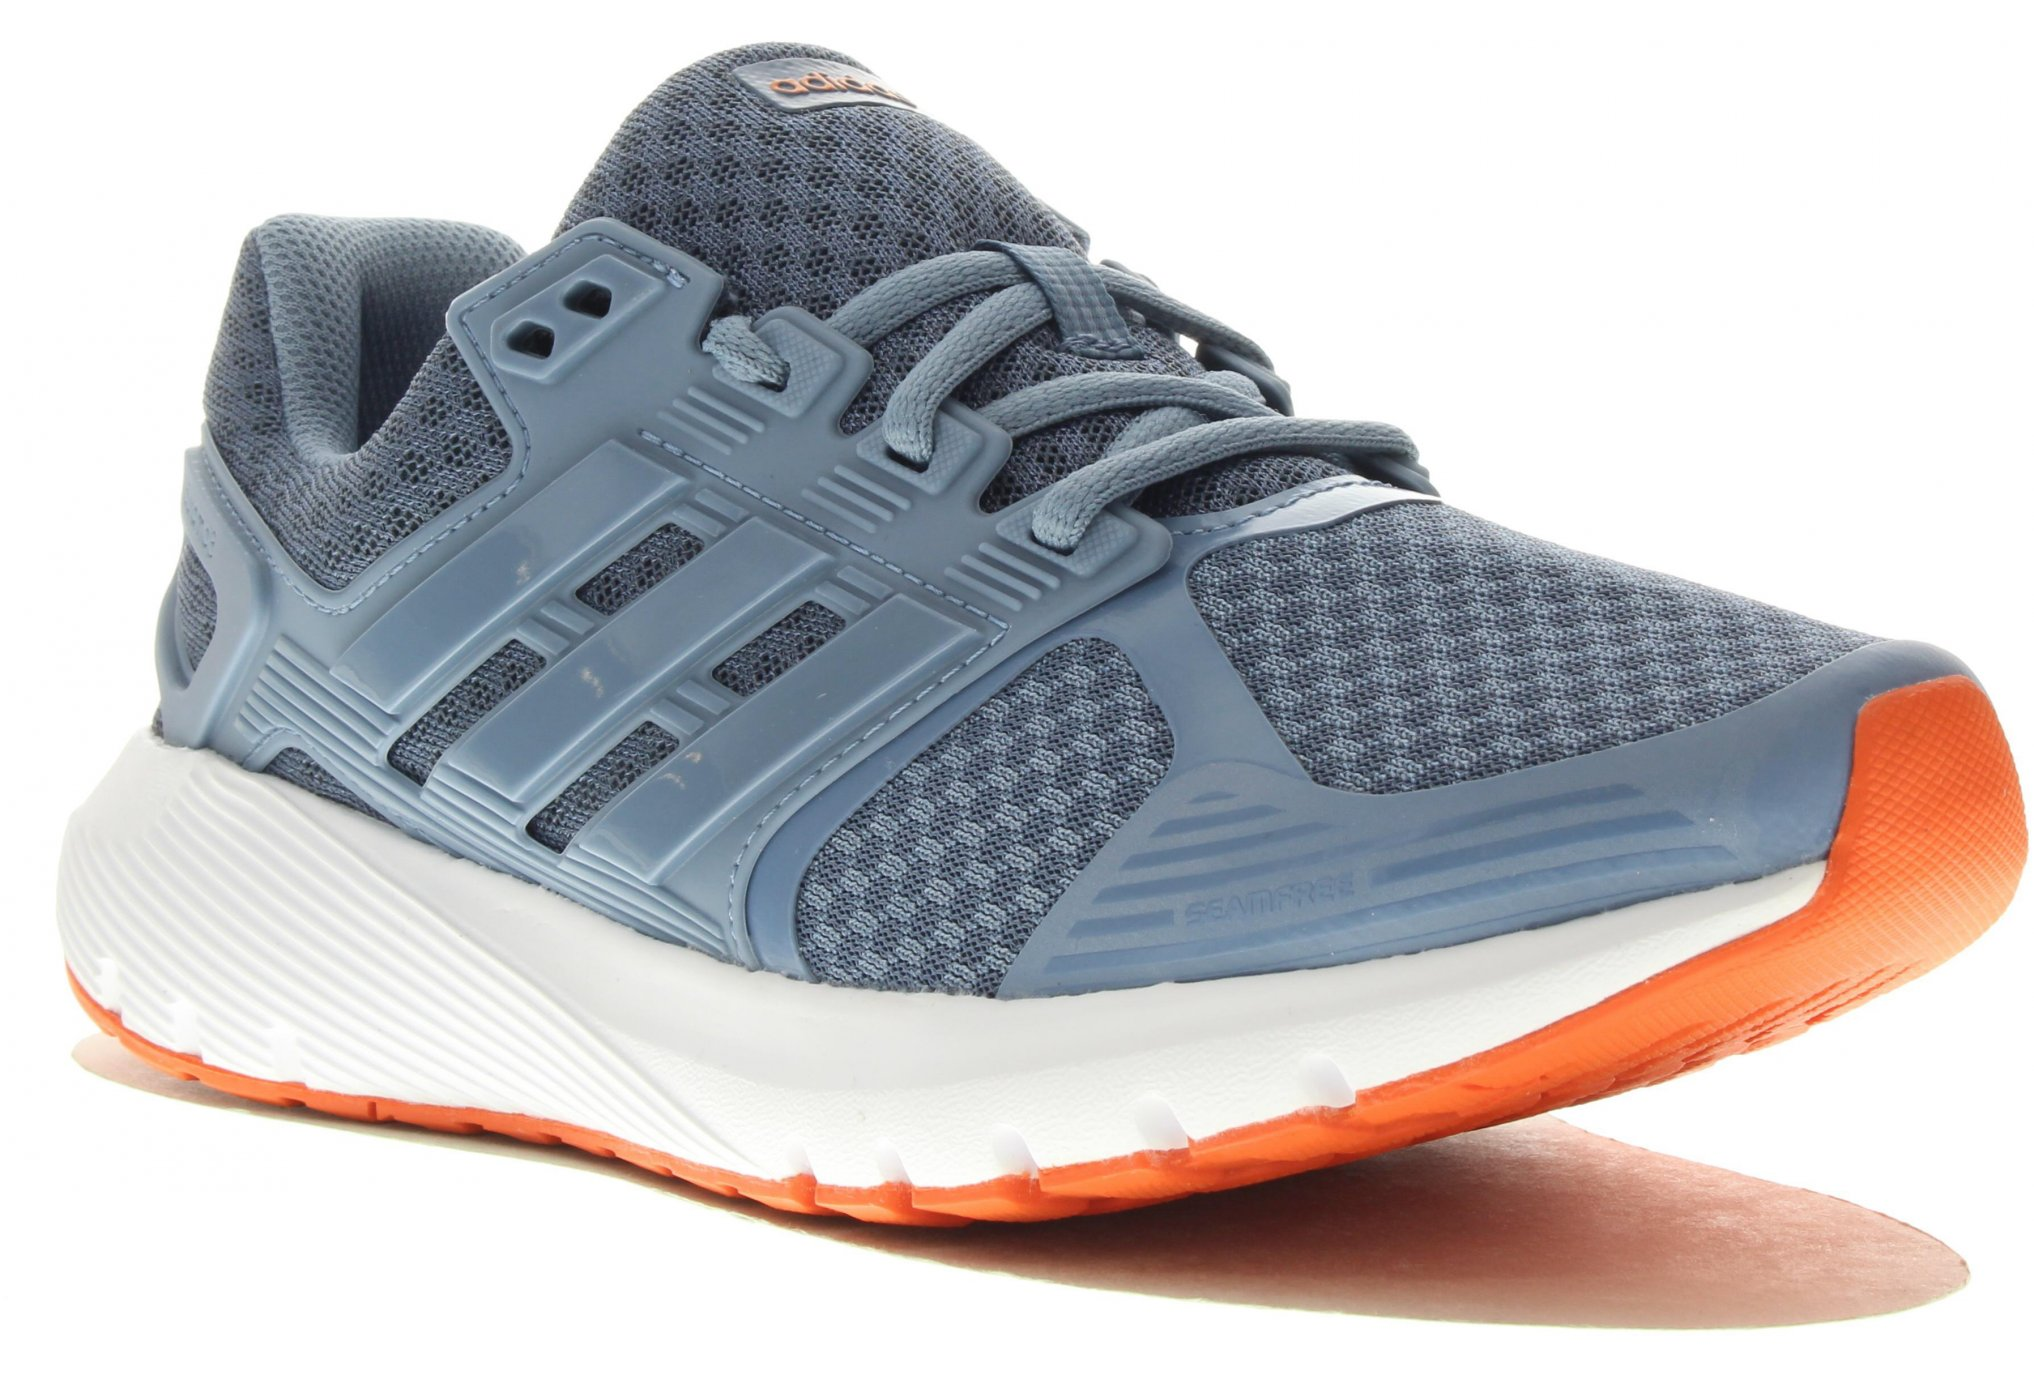 on sale e92a3 dd36d adidas Duramo 8 Junior Chaussures homme